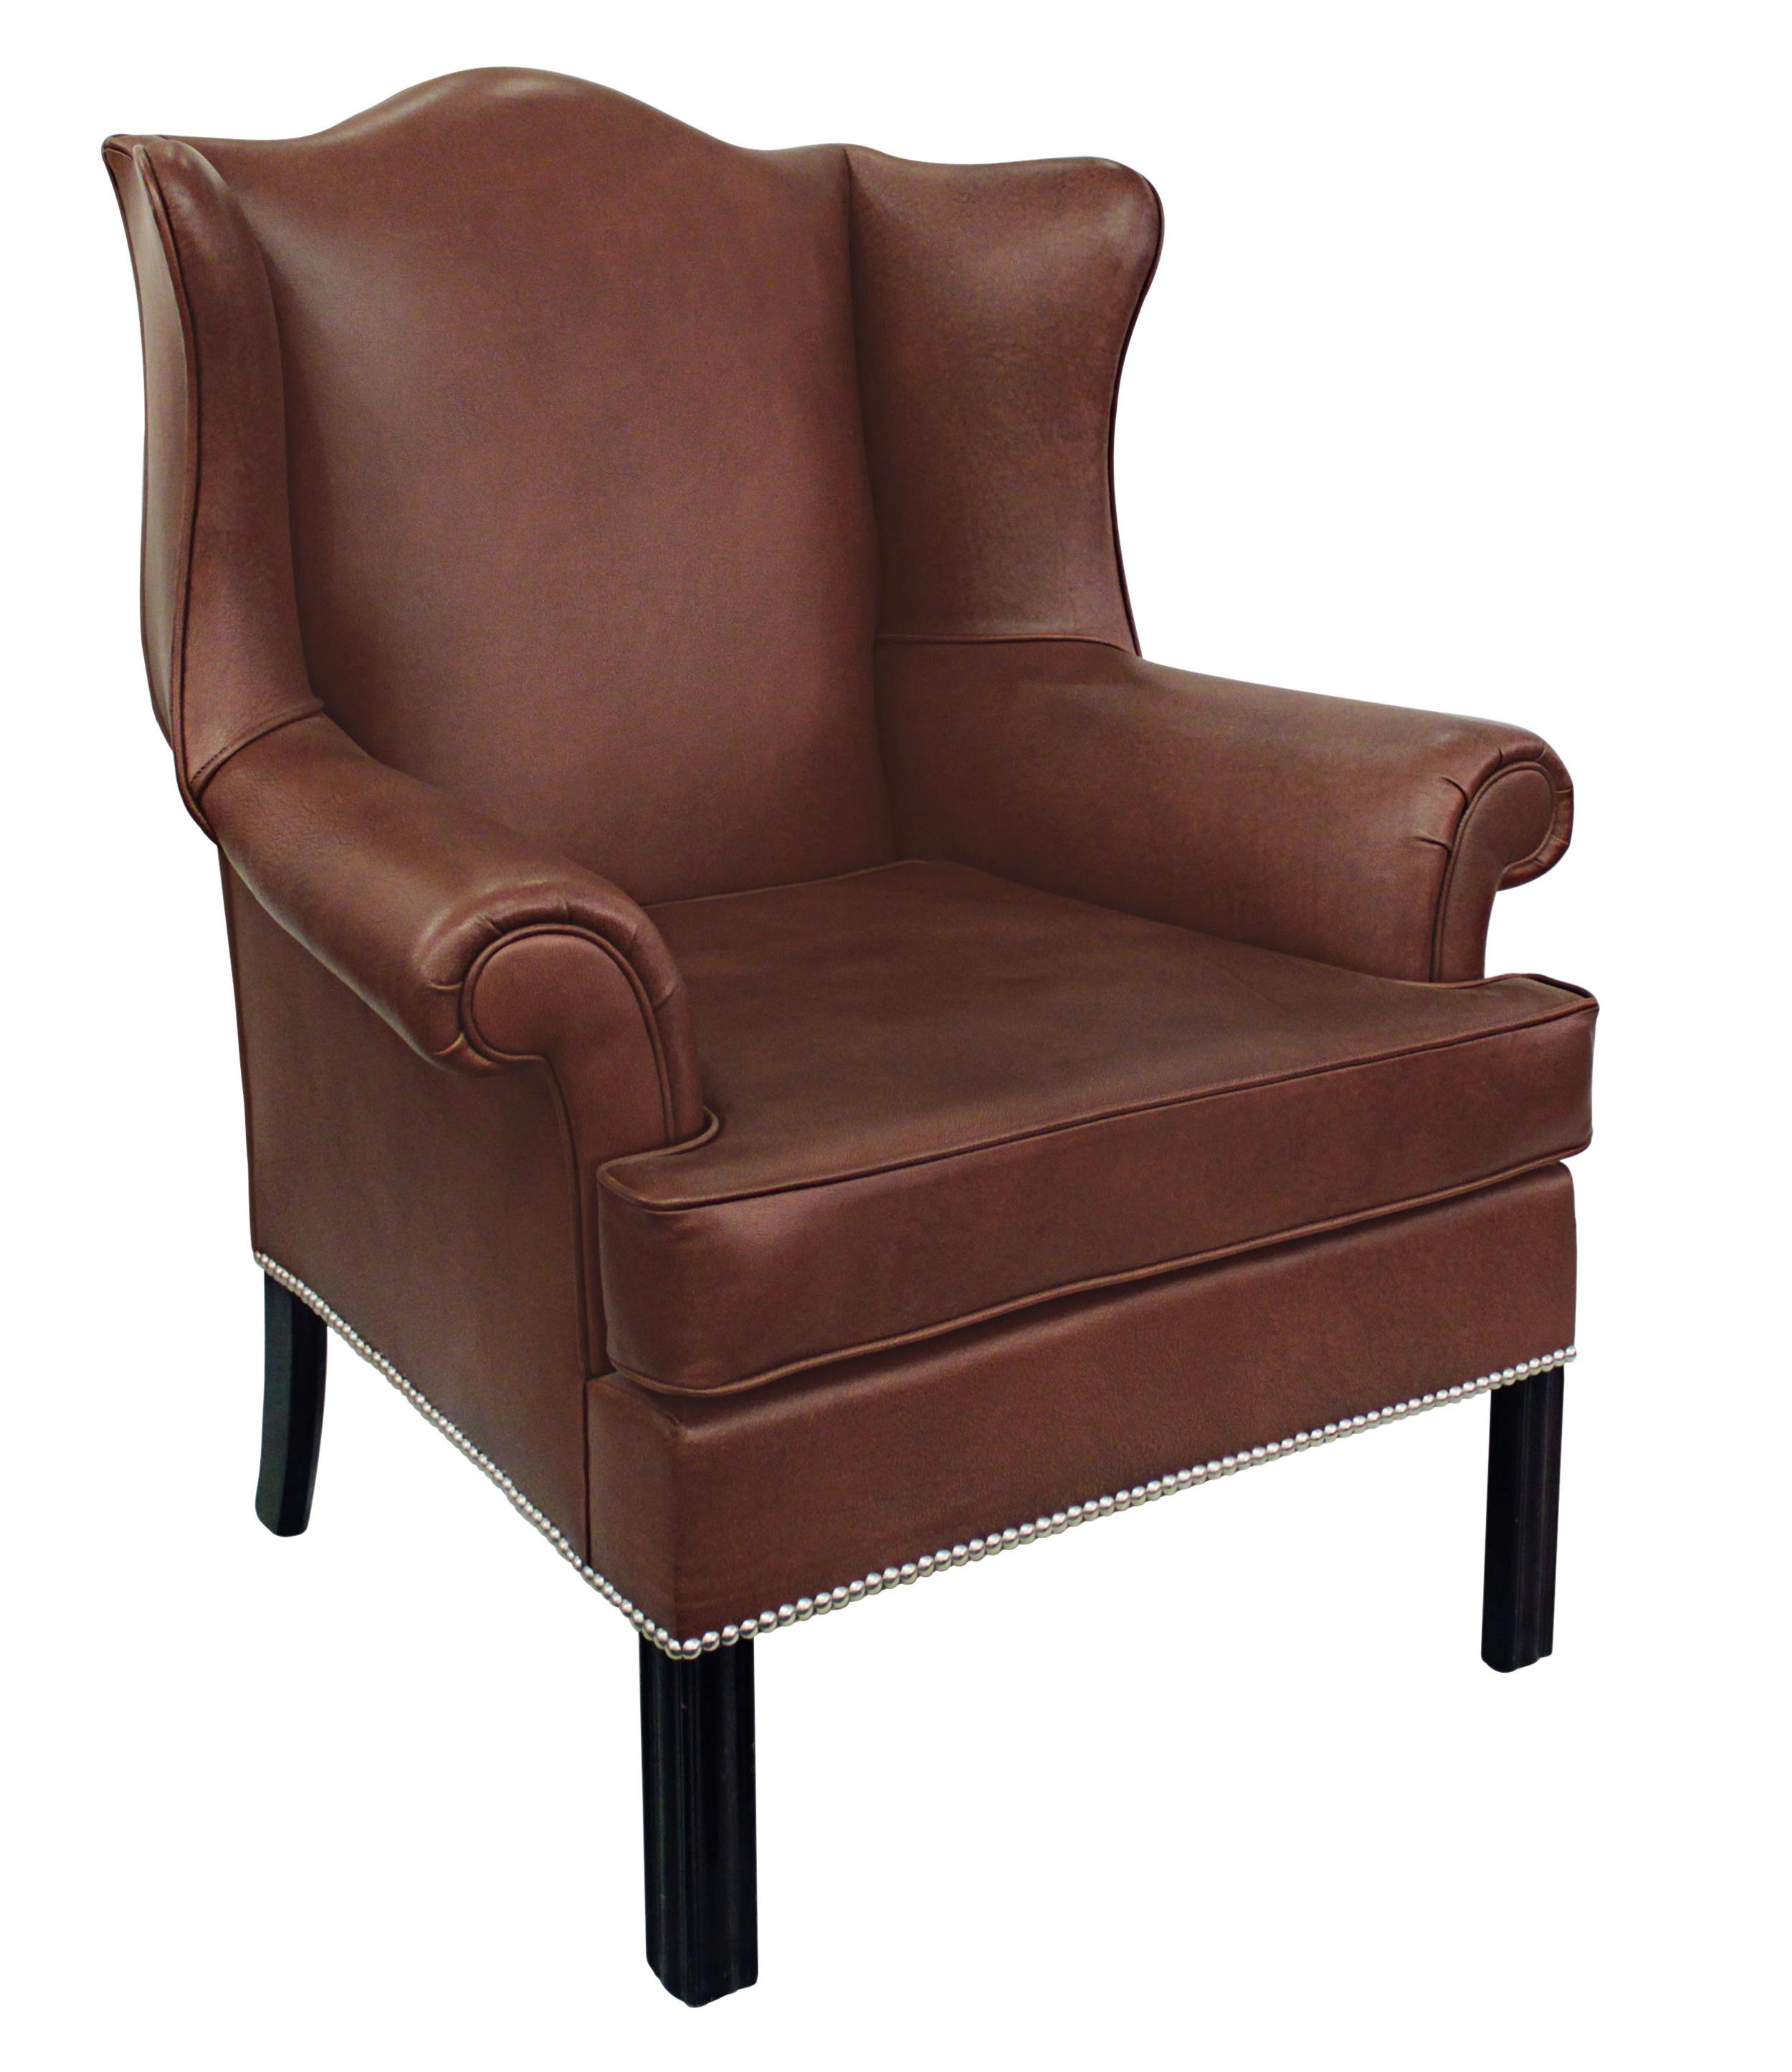 Dunbar 65 late30's wingchair clubchair32 hires.jpg